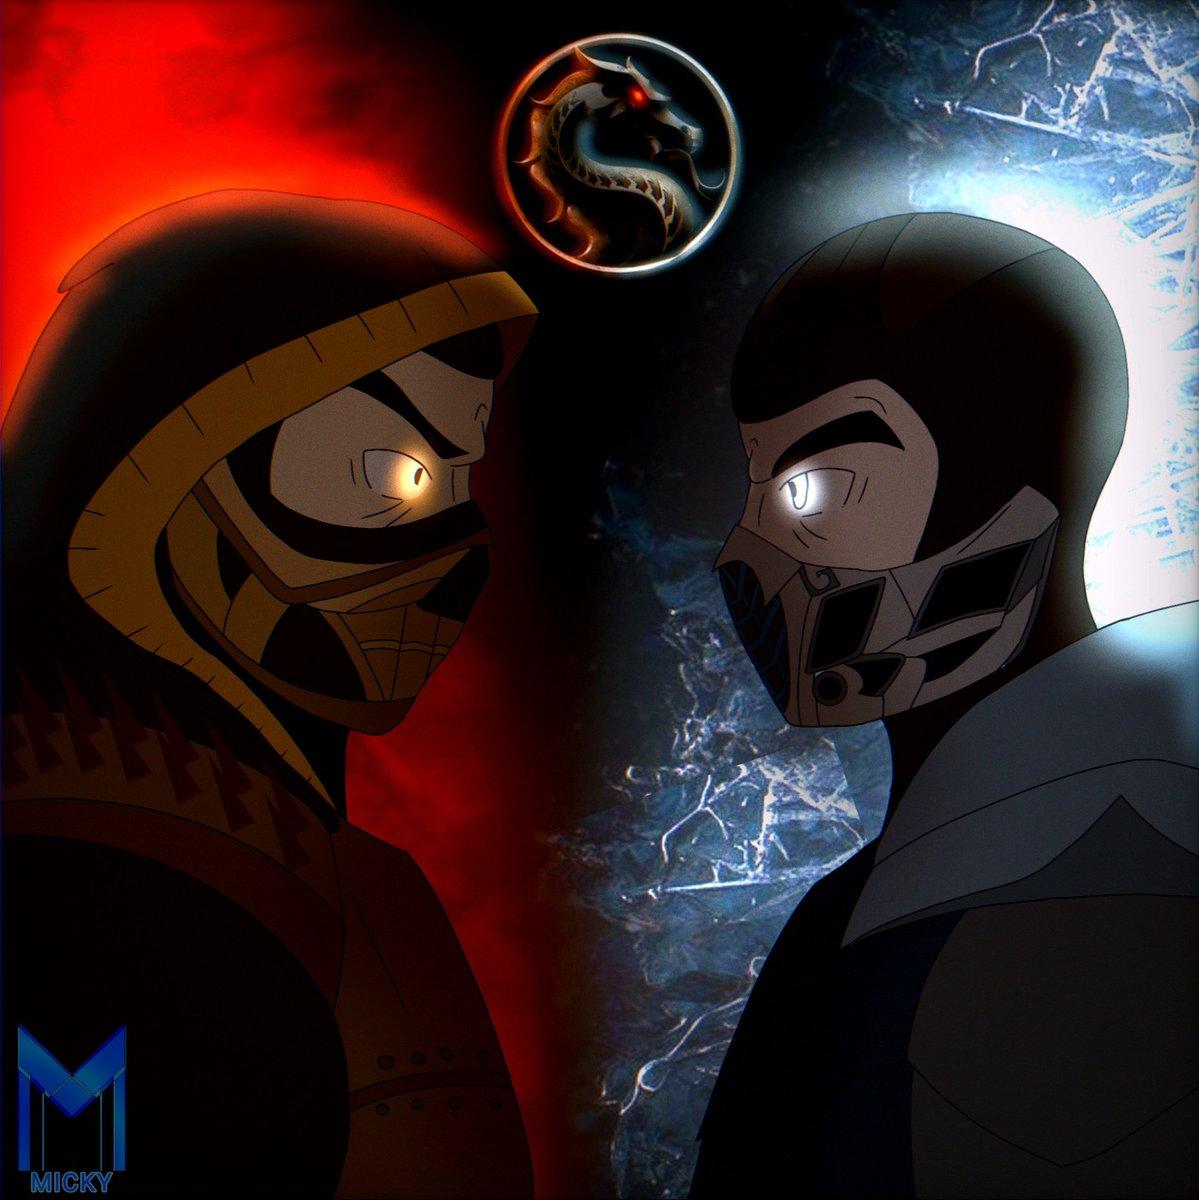 Mortal Kombat Movie #mortalkombat #mortalkombatmovie #mkmovie #mortalkombatart #Art #Artwork